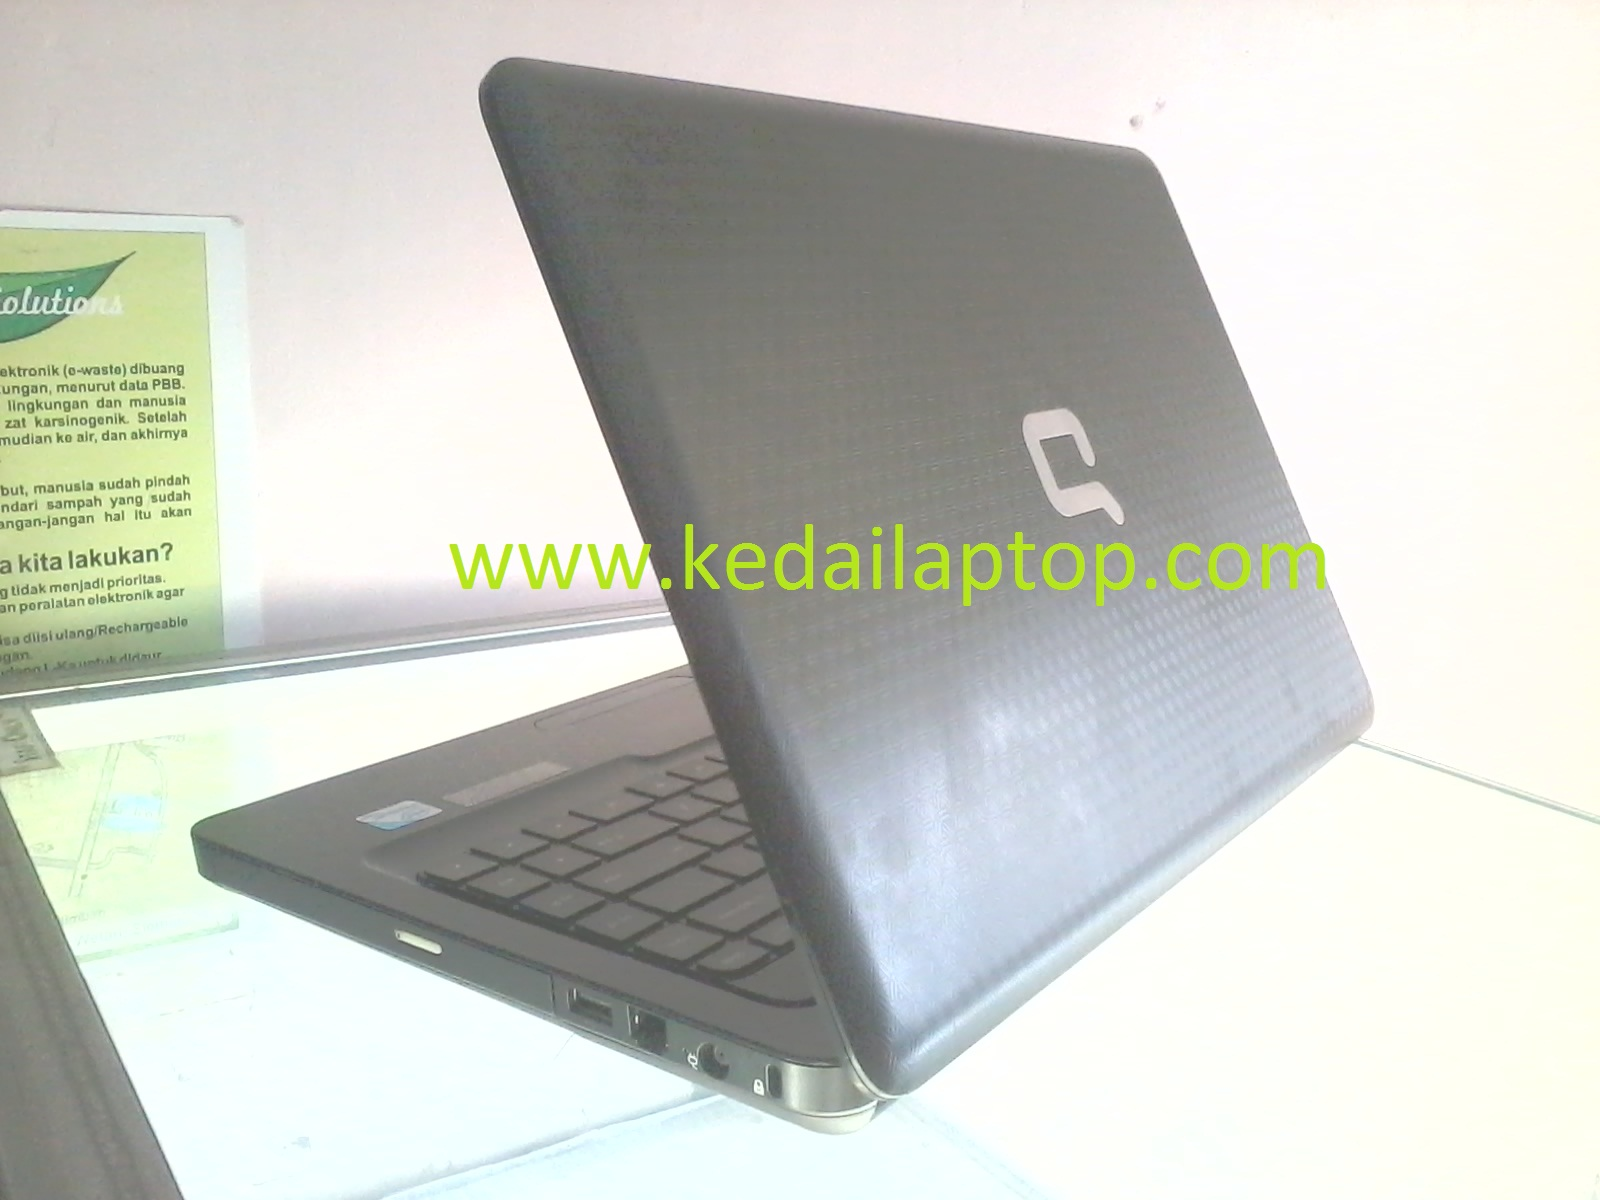 Axioo Keyboard Laptop M1110 Pjm Daftar Harga Terkini Termurah Dan Pico Cjm Cjw 812 A812 713 715 512 Zyrex Driver